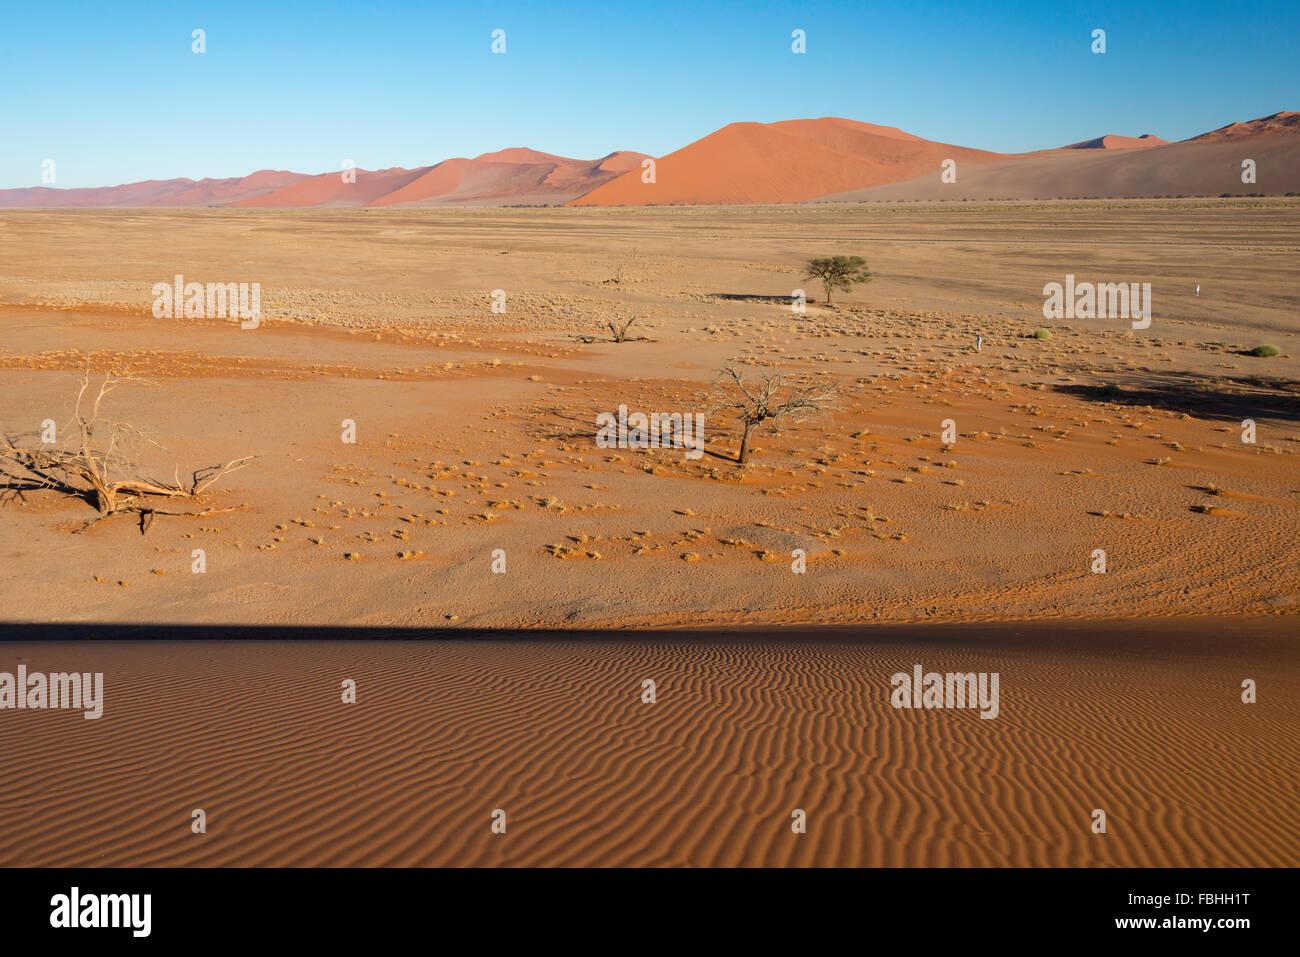 Desert view from sand dune, Sossusvlei, Namib Desert, Namib-Naukluft Park, Hardap Region, Republic of Namibia - Stock Image